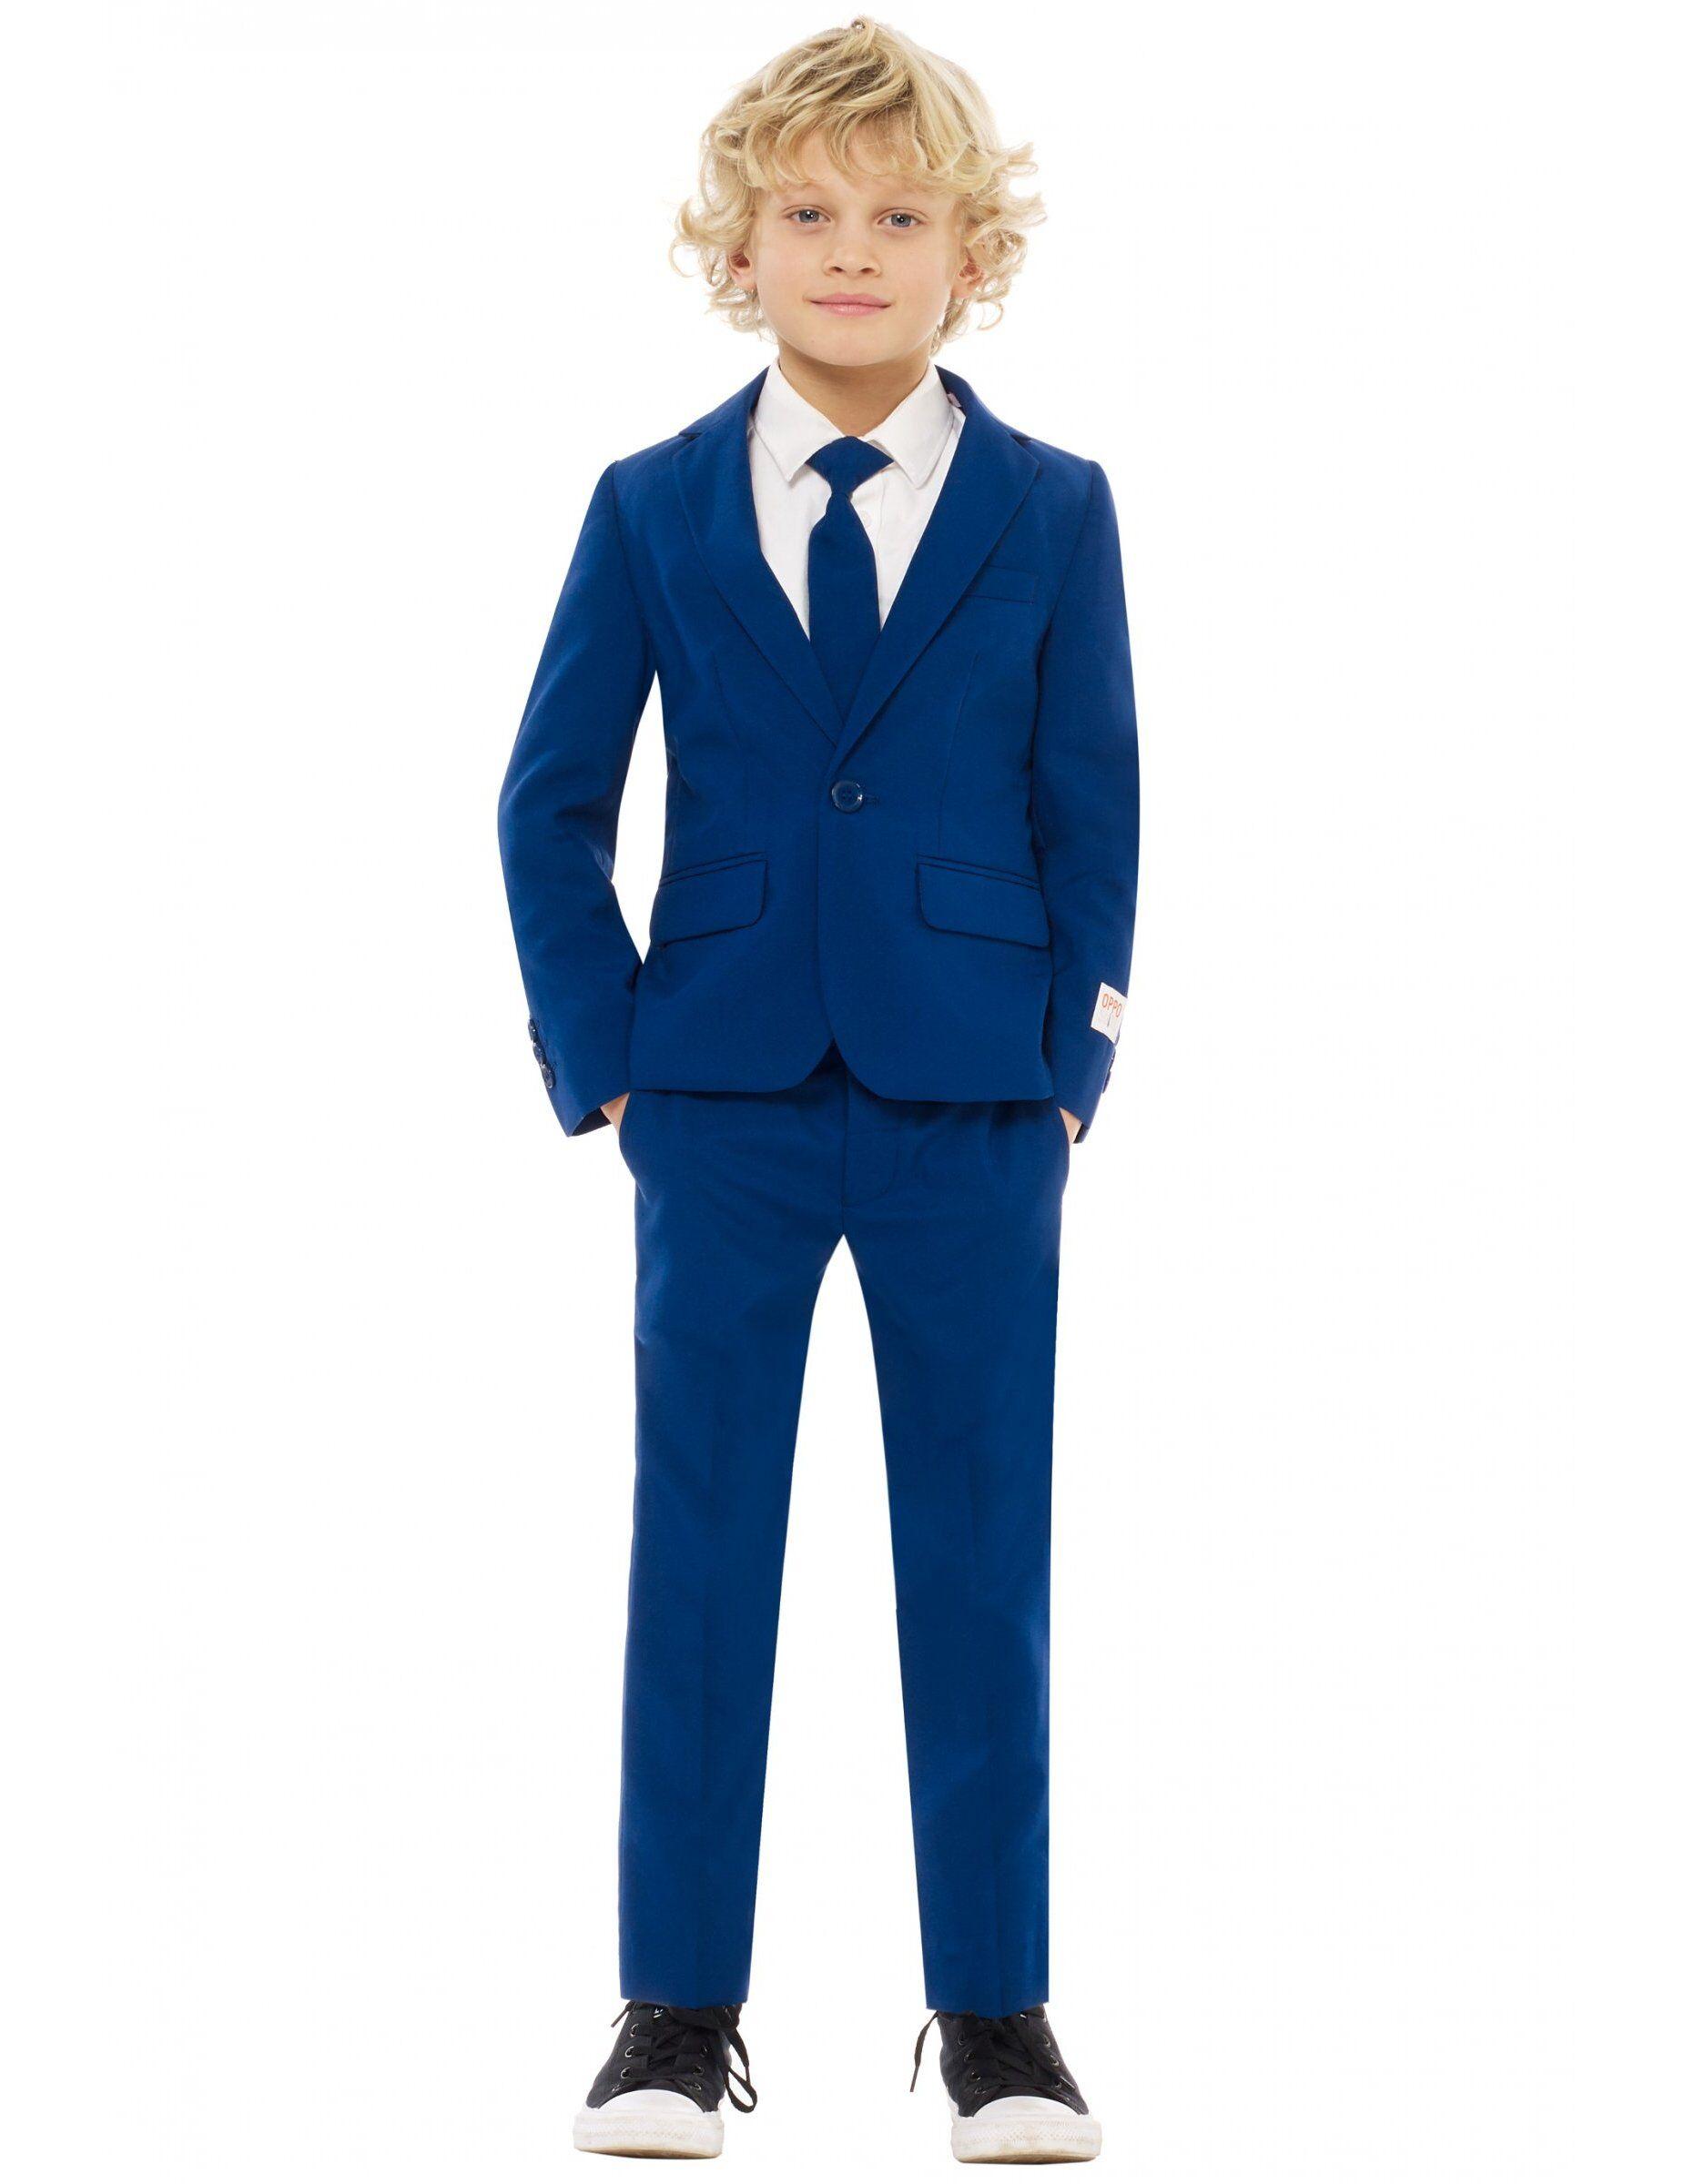 Vegaoo Costume Mr Blu bambino Opposuits - 4 - 6 anni (98 - 104 cm)